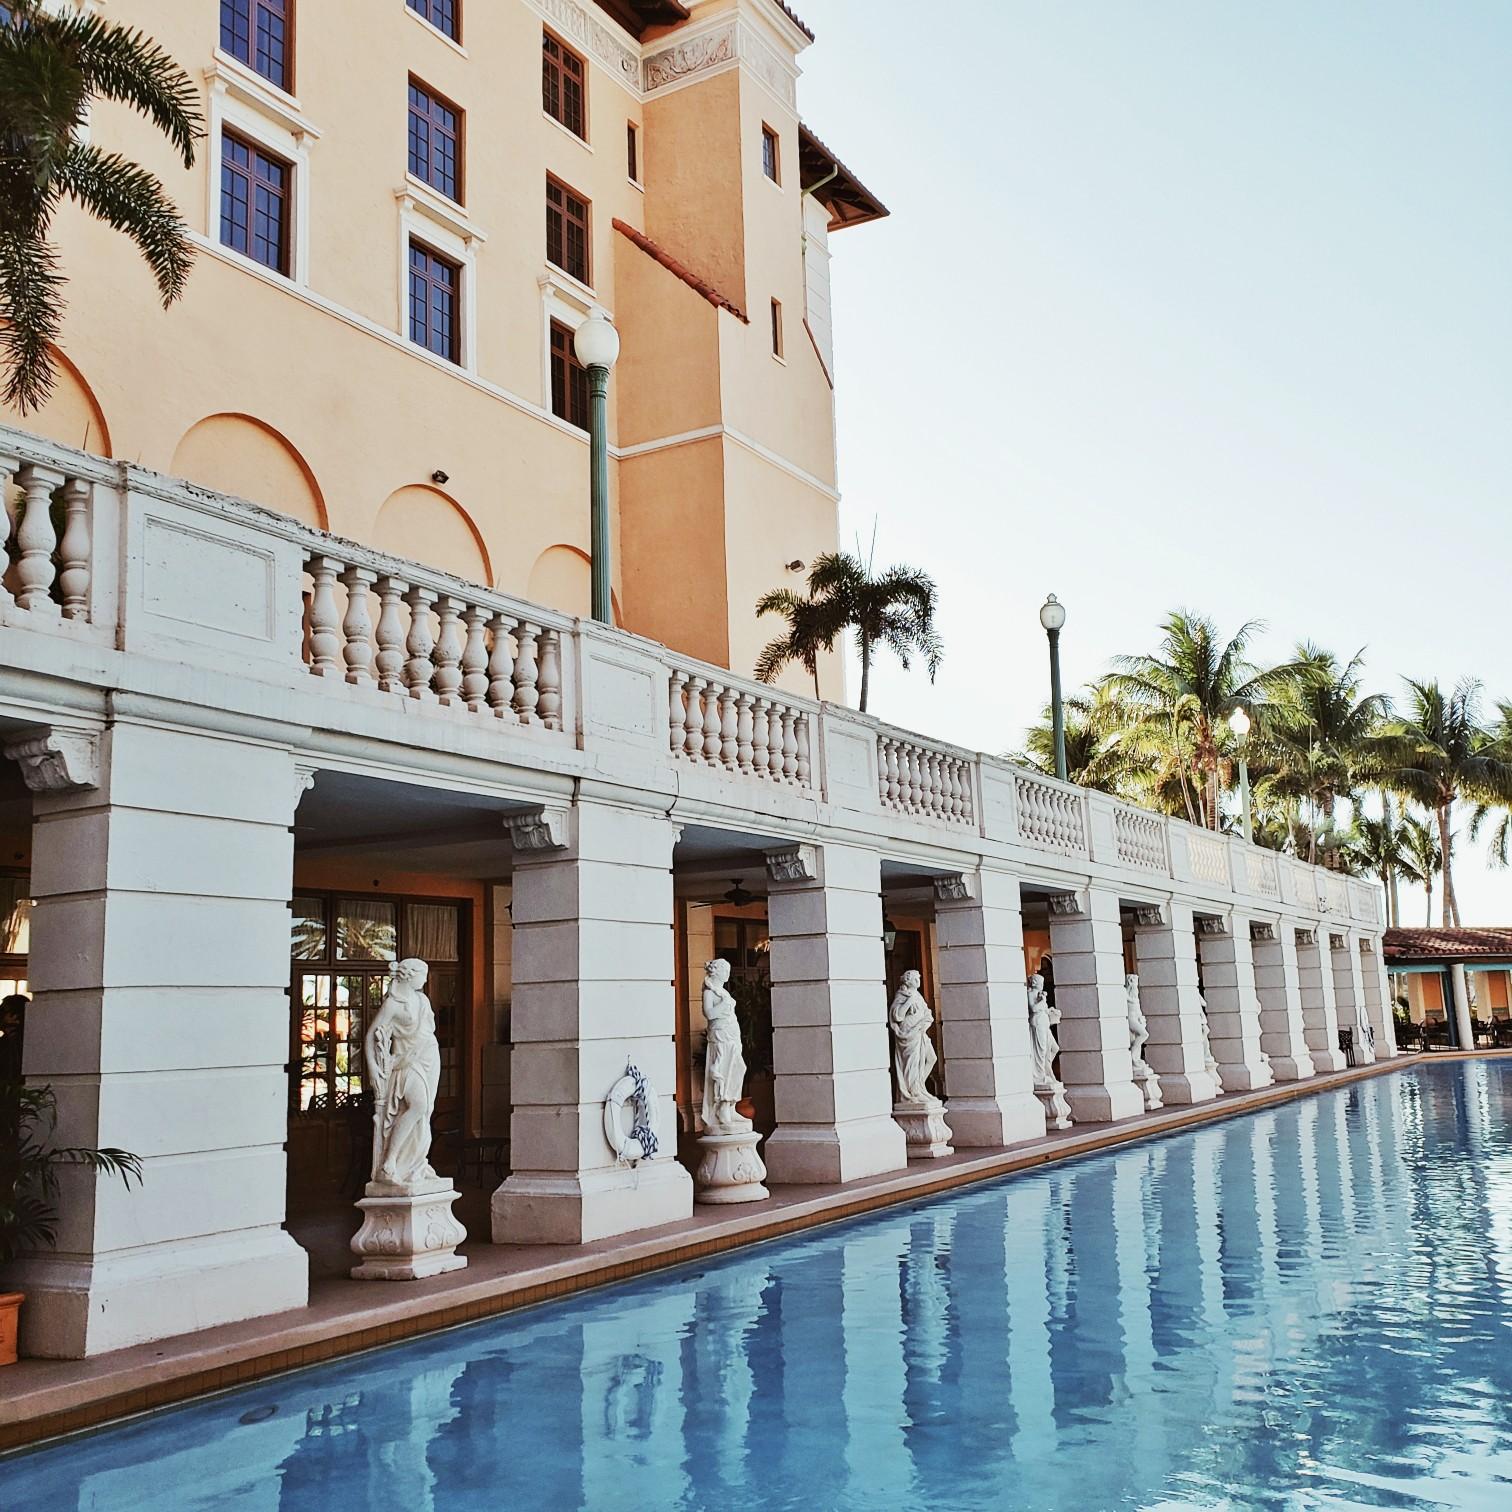 Biltmore Hotel Miami Coral Gables Luxury Staycation Vintage Pool